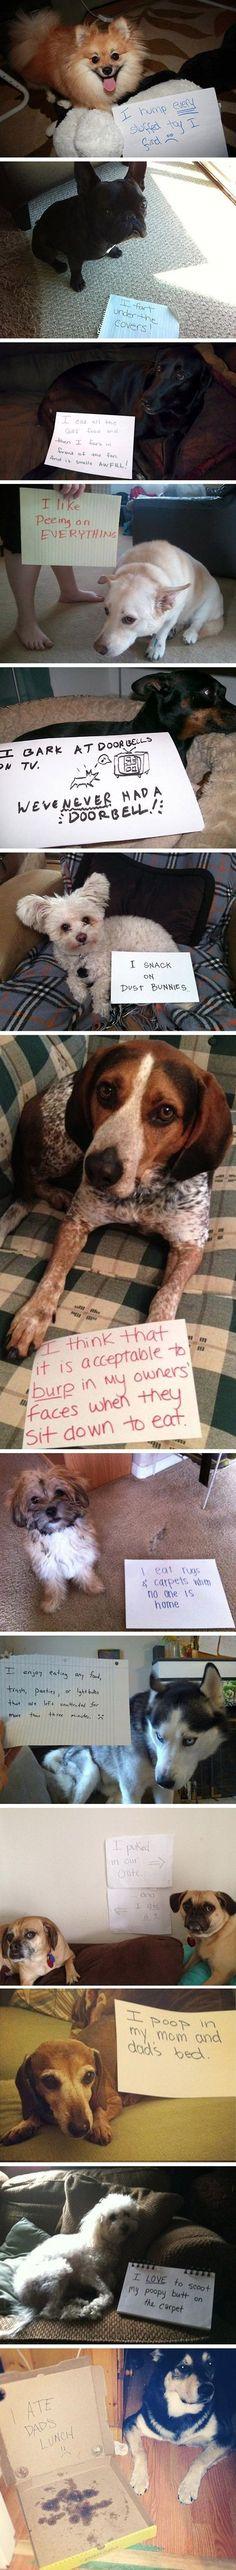 Shaming Dogs